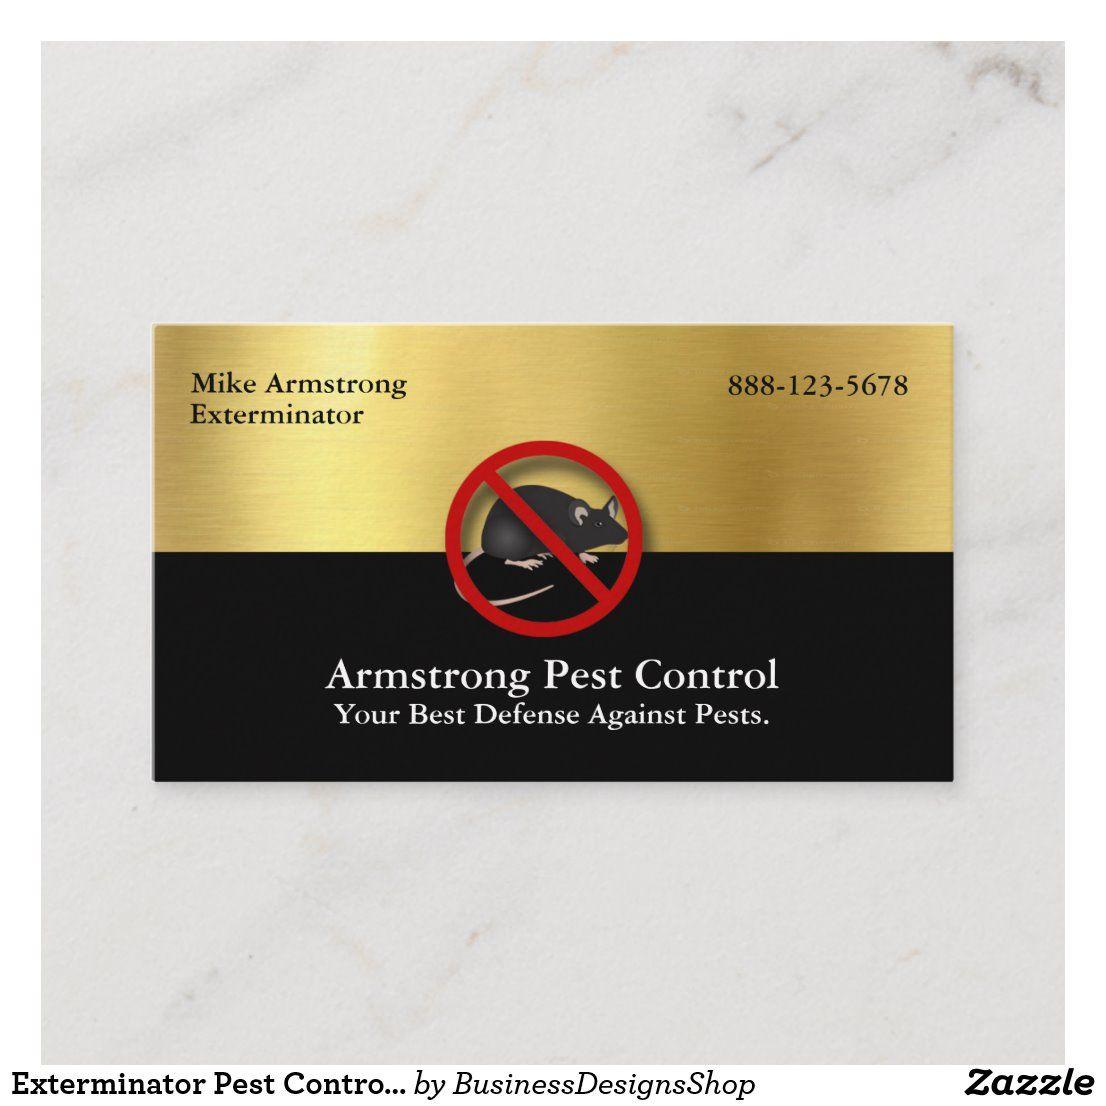 Exterminator Pest Control Mouse Rodents Business Card Zazzle Com Pest Control Mice Exterminator Pest Control